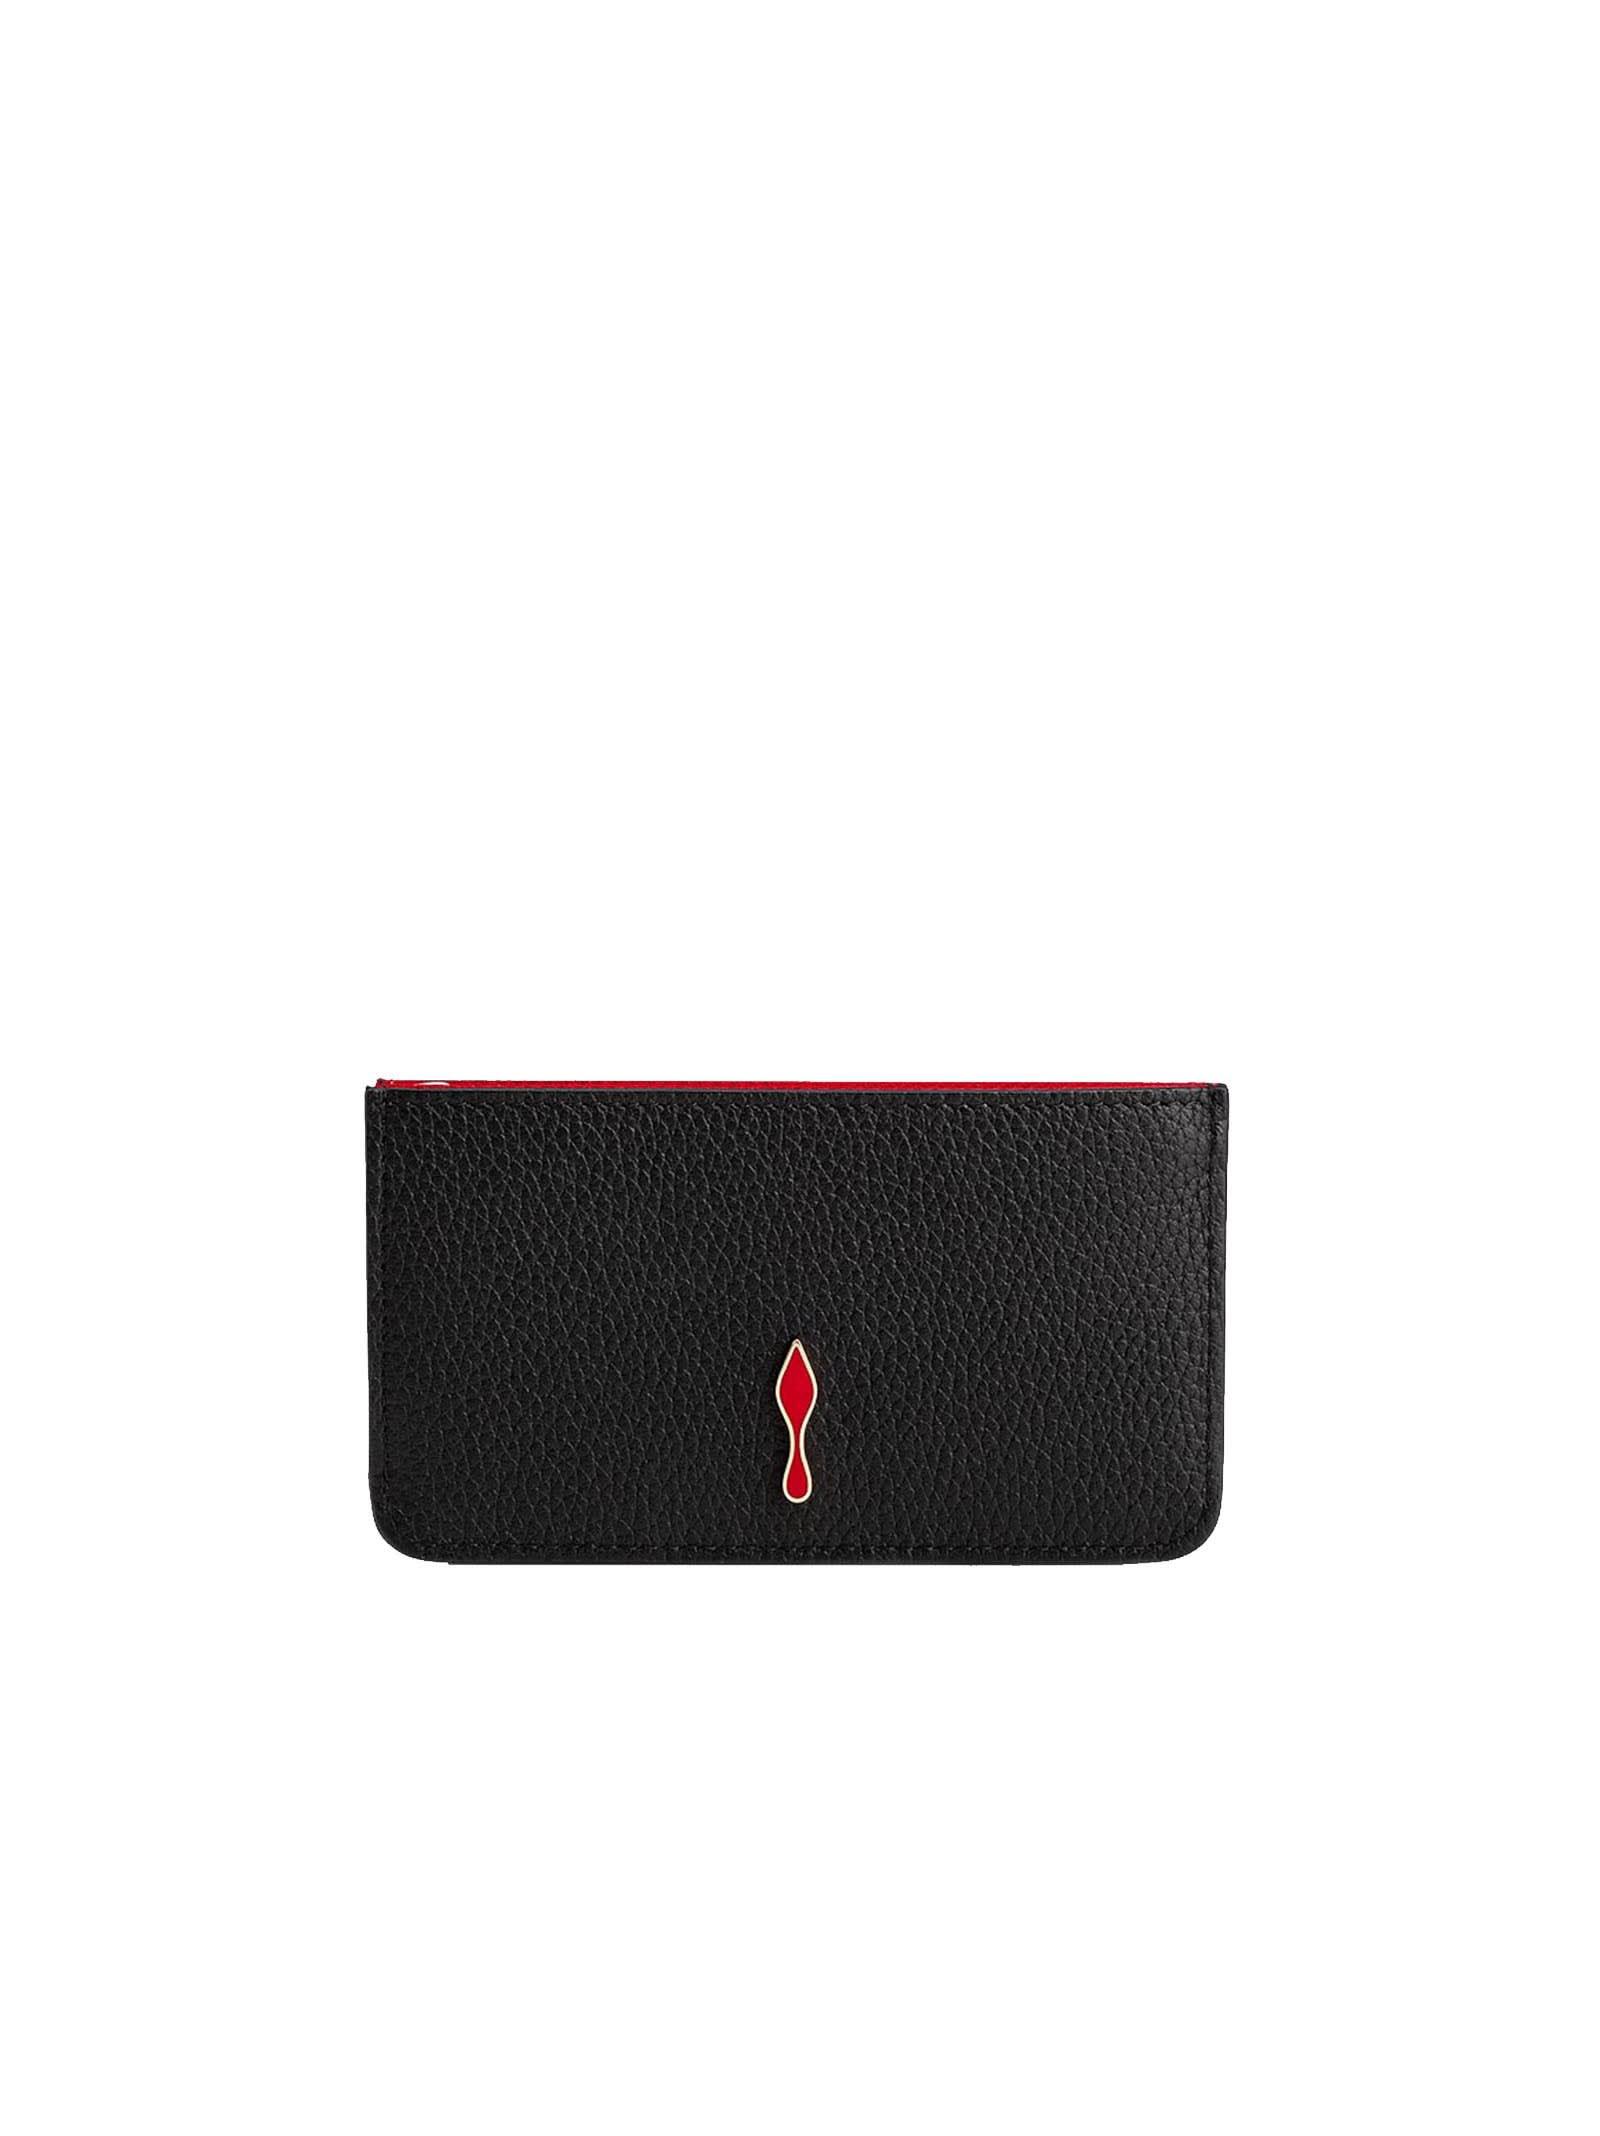 Christian Louboutin Christian Louboutin Black Leather Wallet